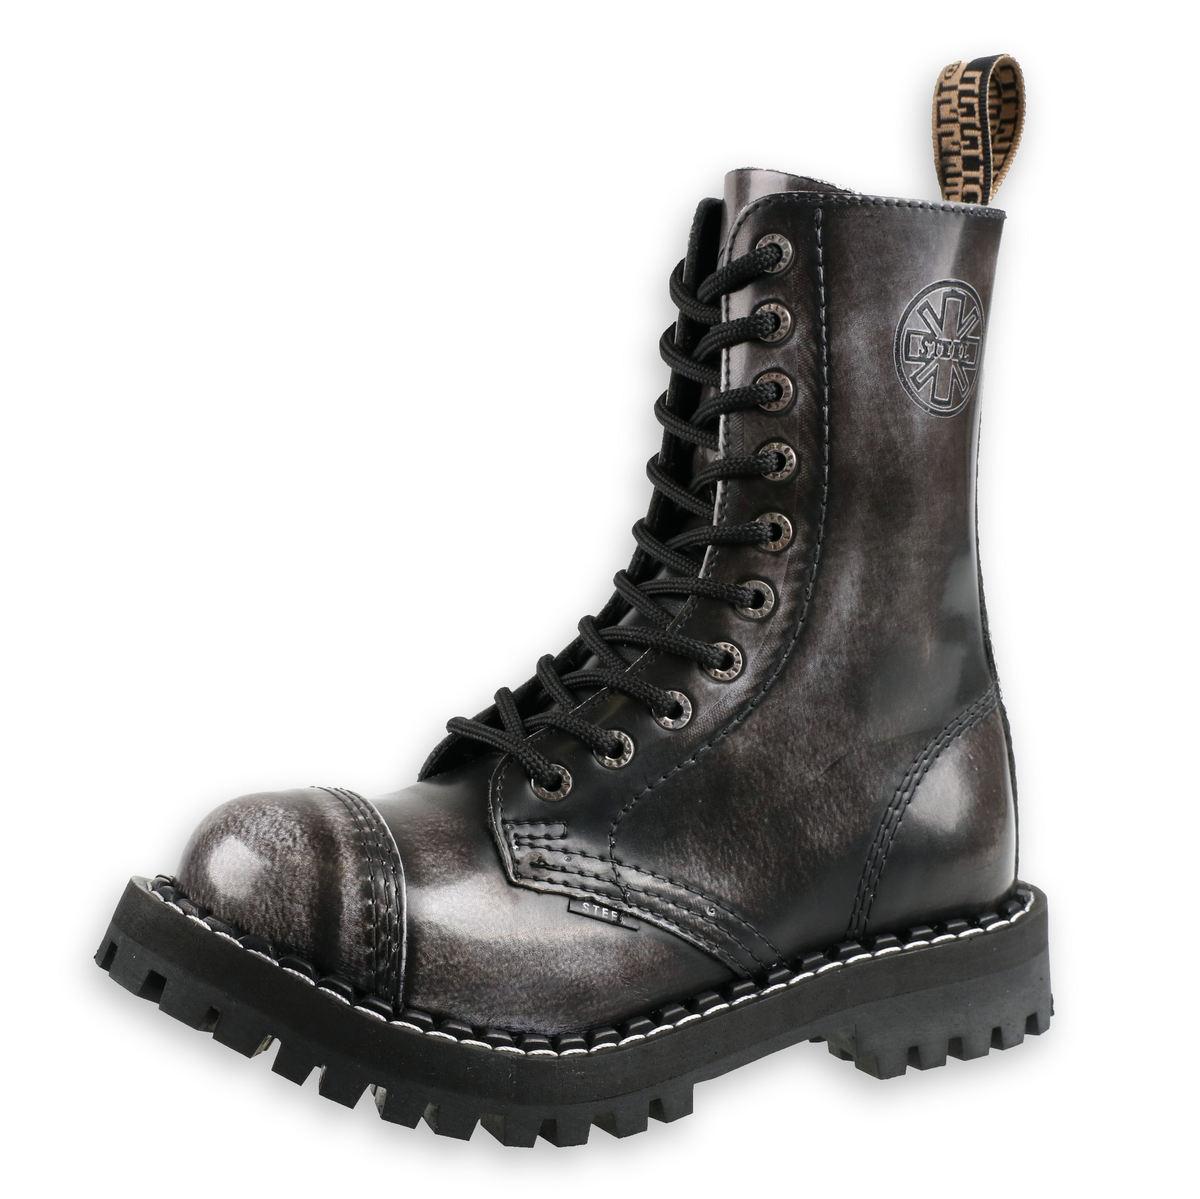 a369c779eb6d9 topánky STEEL - 10 dierkové čierne ( 105/106 Black) 10tich-dierkové ...